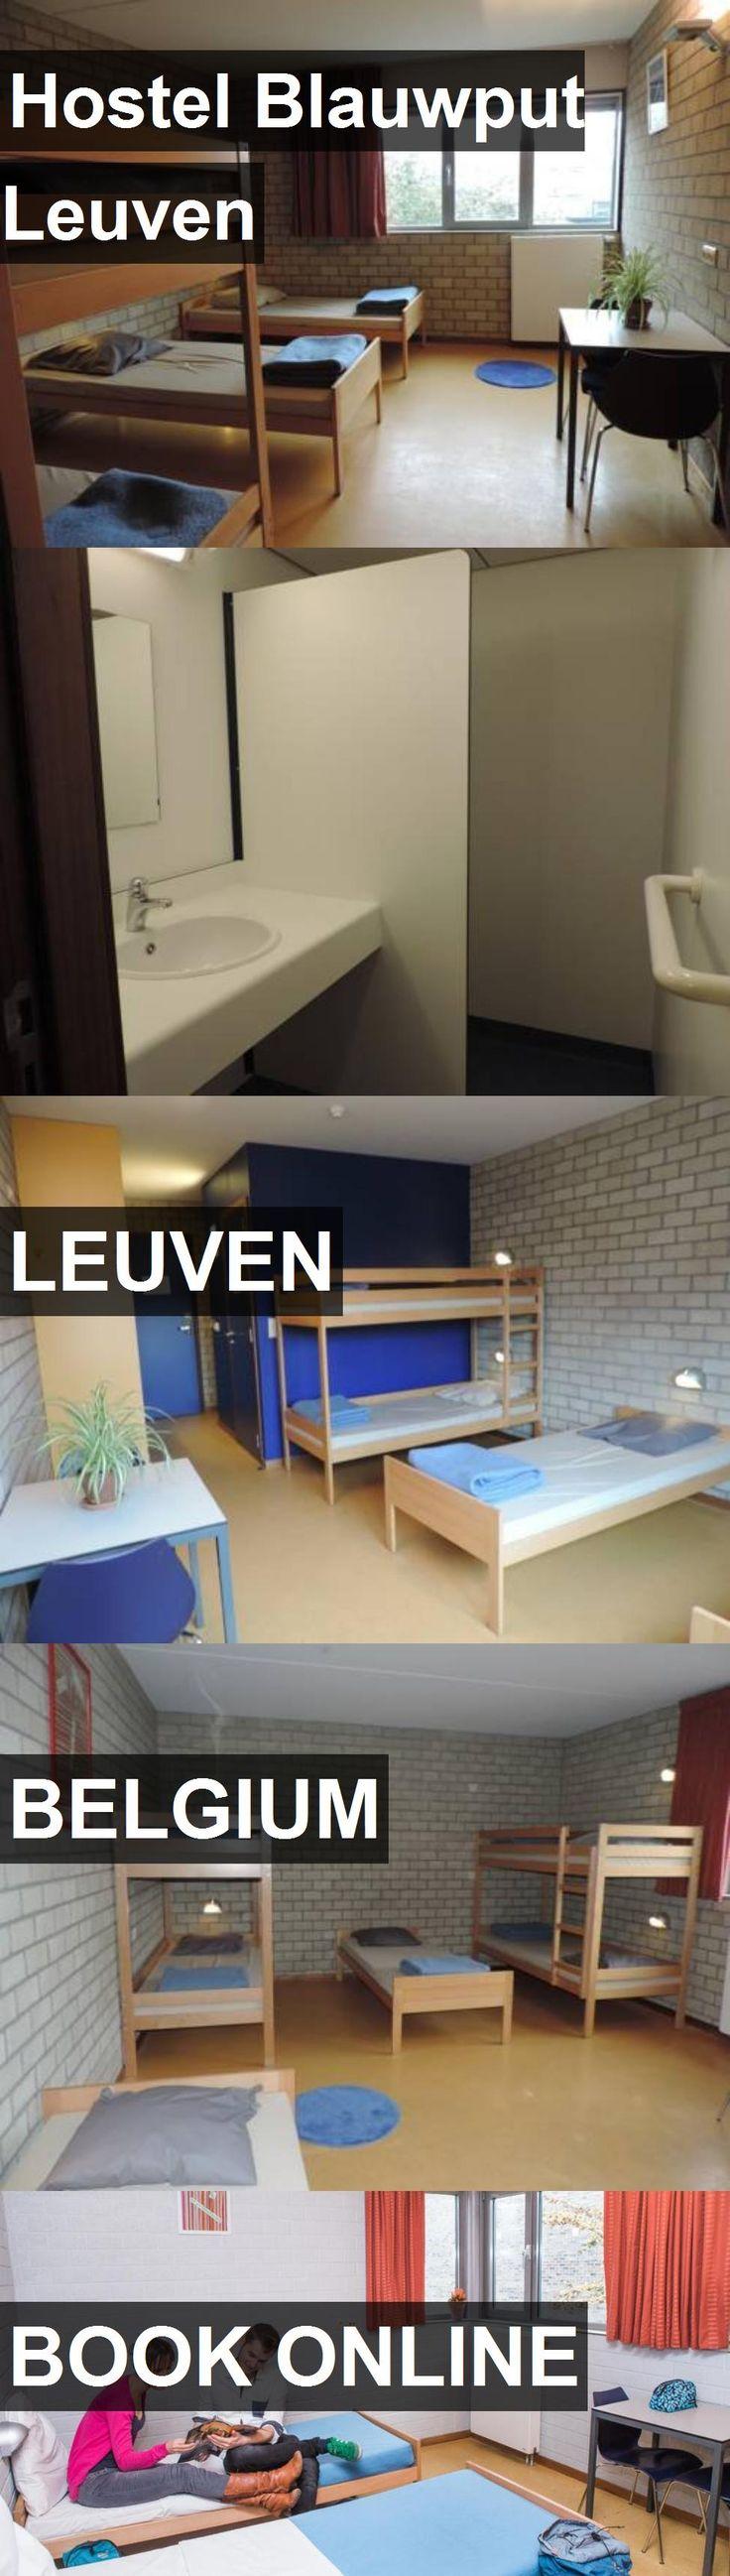 Hostel Blauwput Leuven in LEUVEN, Belgium. For more information, photos, reviews and best prices please follow the link. #Belgium #LEUVEN #travel #vacation #hostel